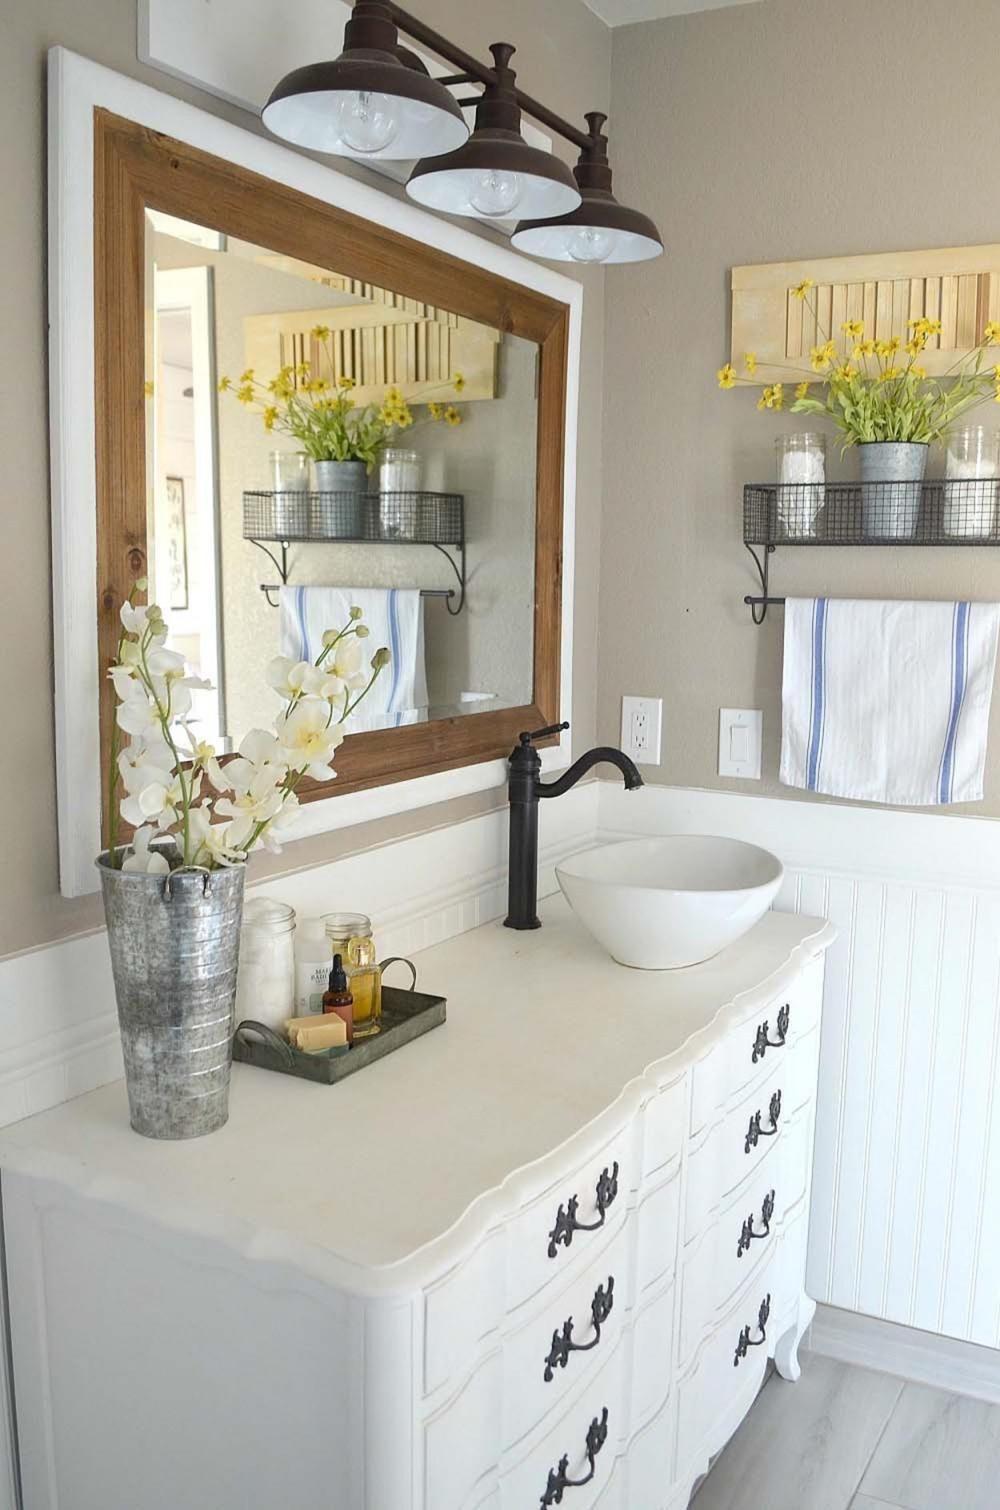 26 Charming Farmhouse Bathroom Accessories Ideas | Pinterest ...